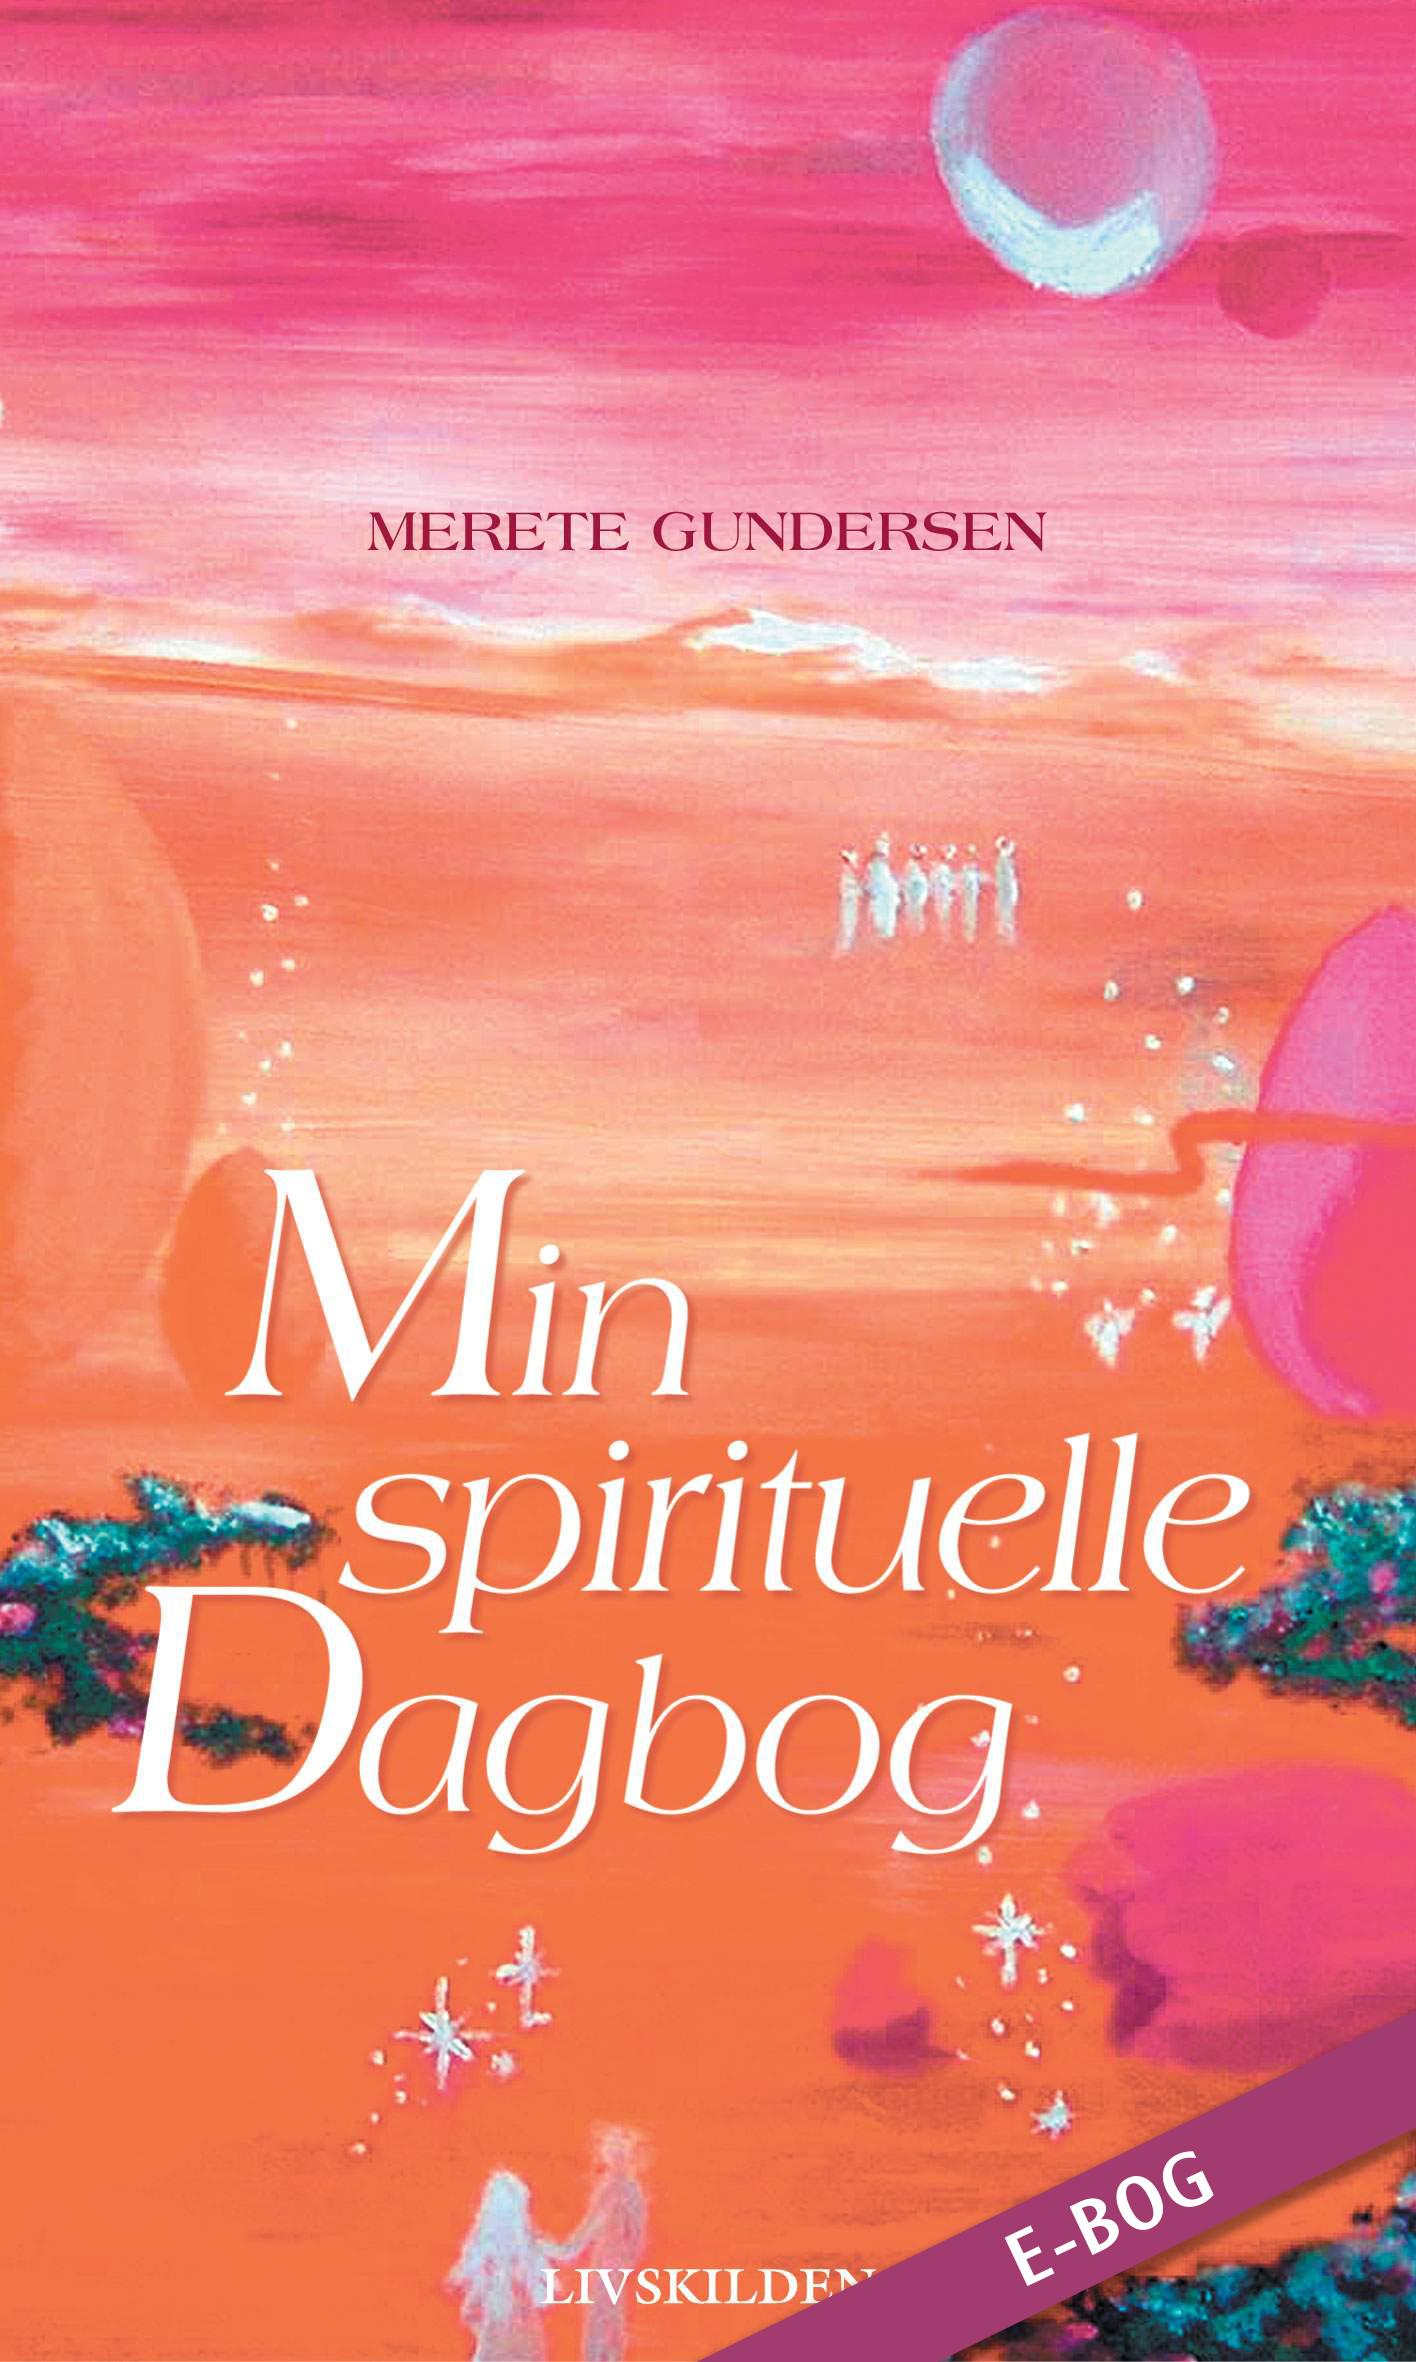 E-bog: Min Spirituelle Dagbog